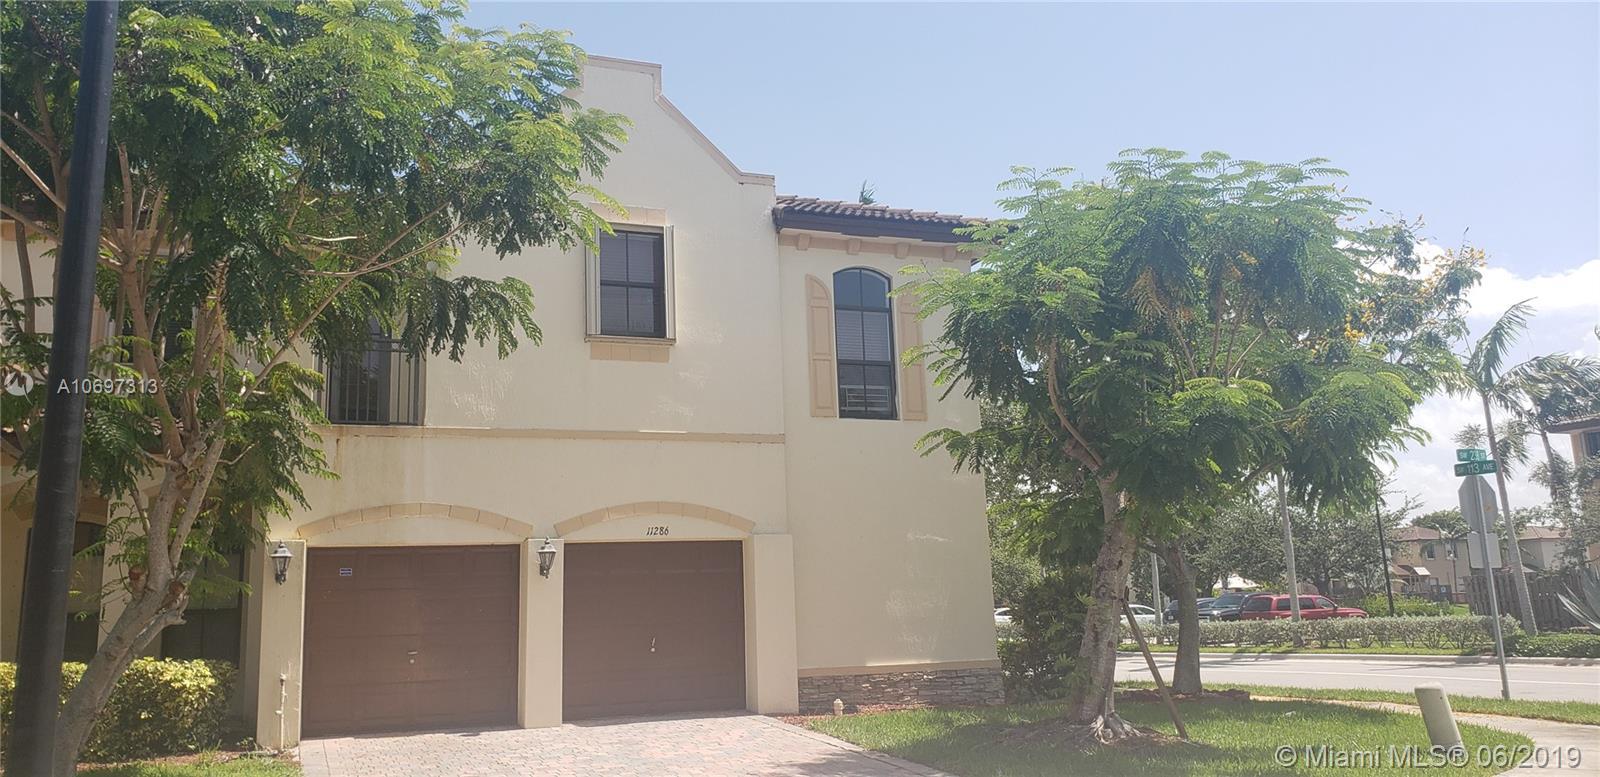 11286 SW 238th St, Homestead, FL 33032 - Homestead, FL real estate listing